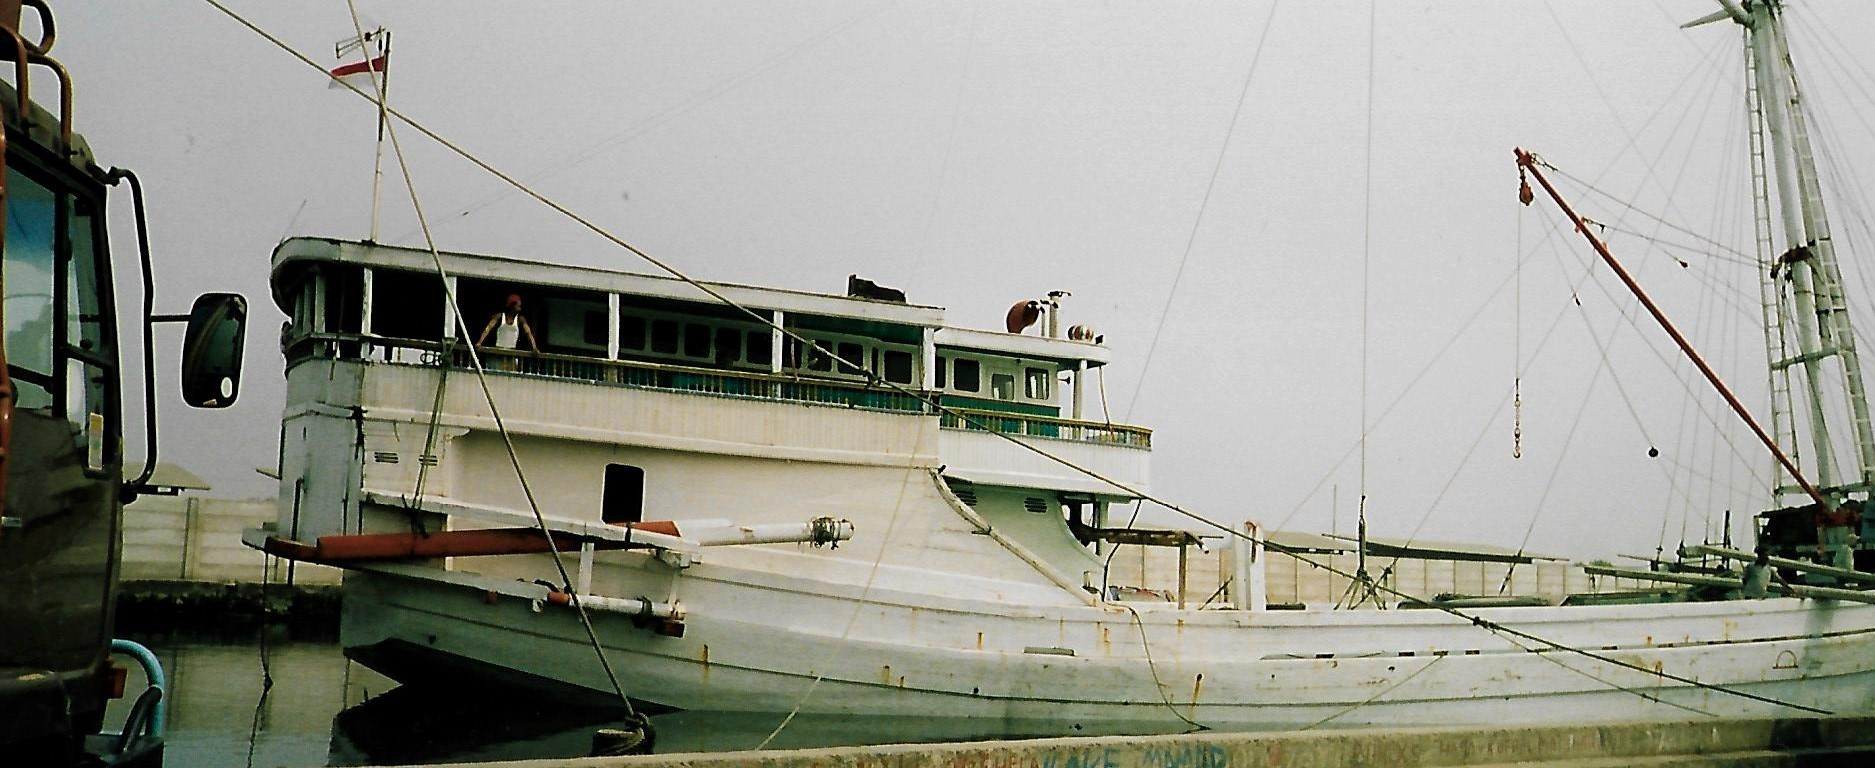 Makassar-Schoner im Hafen Sunda Kelapa